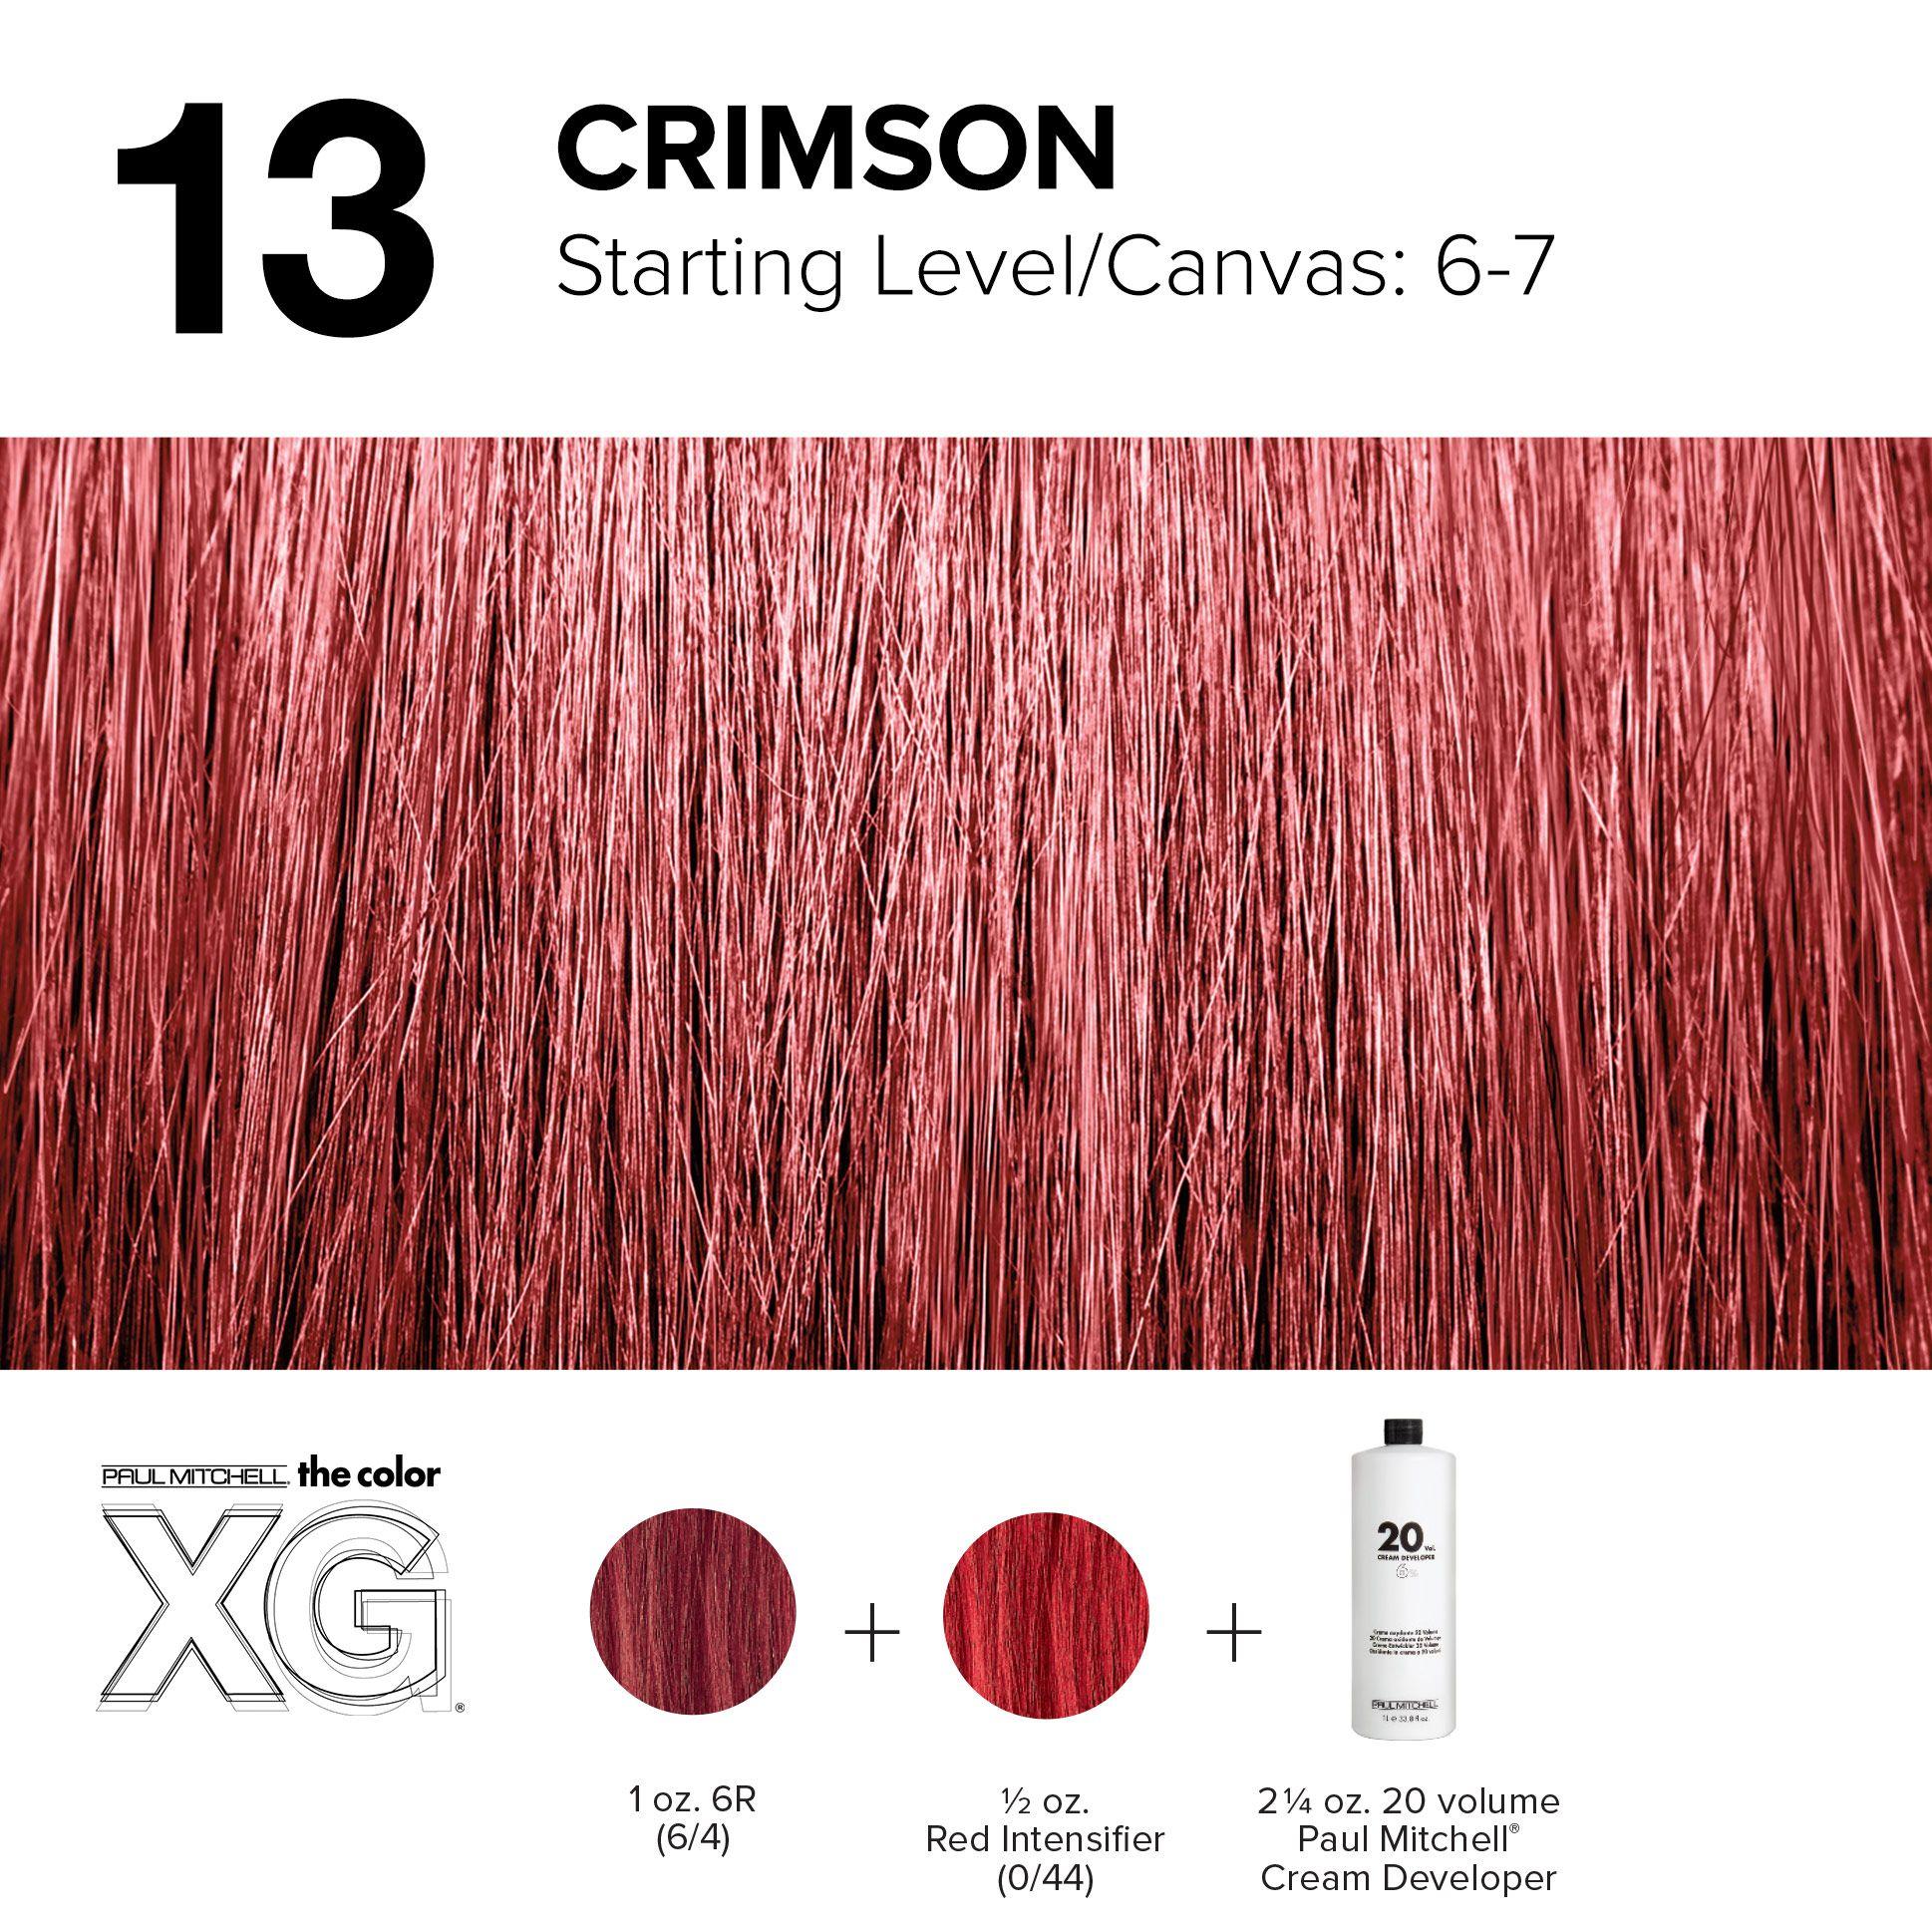 13 Crimson Paul Mitchell Color Hair Color Formulas Red Violet Hair Color